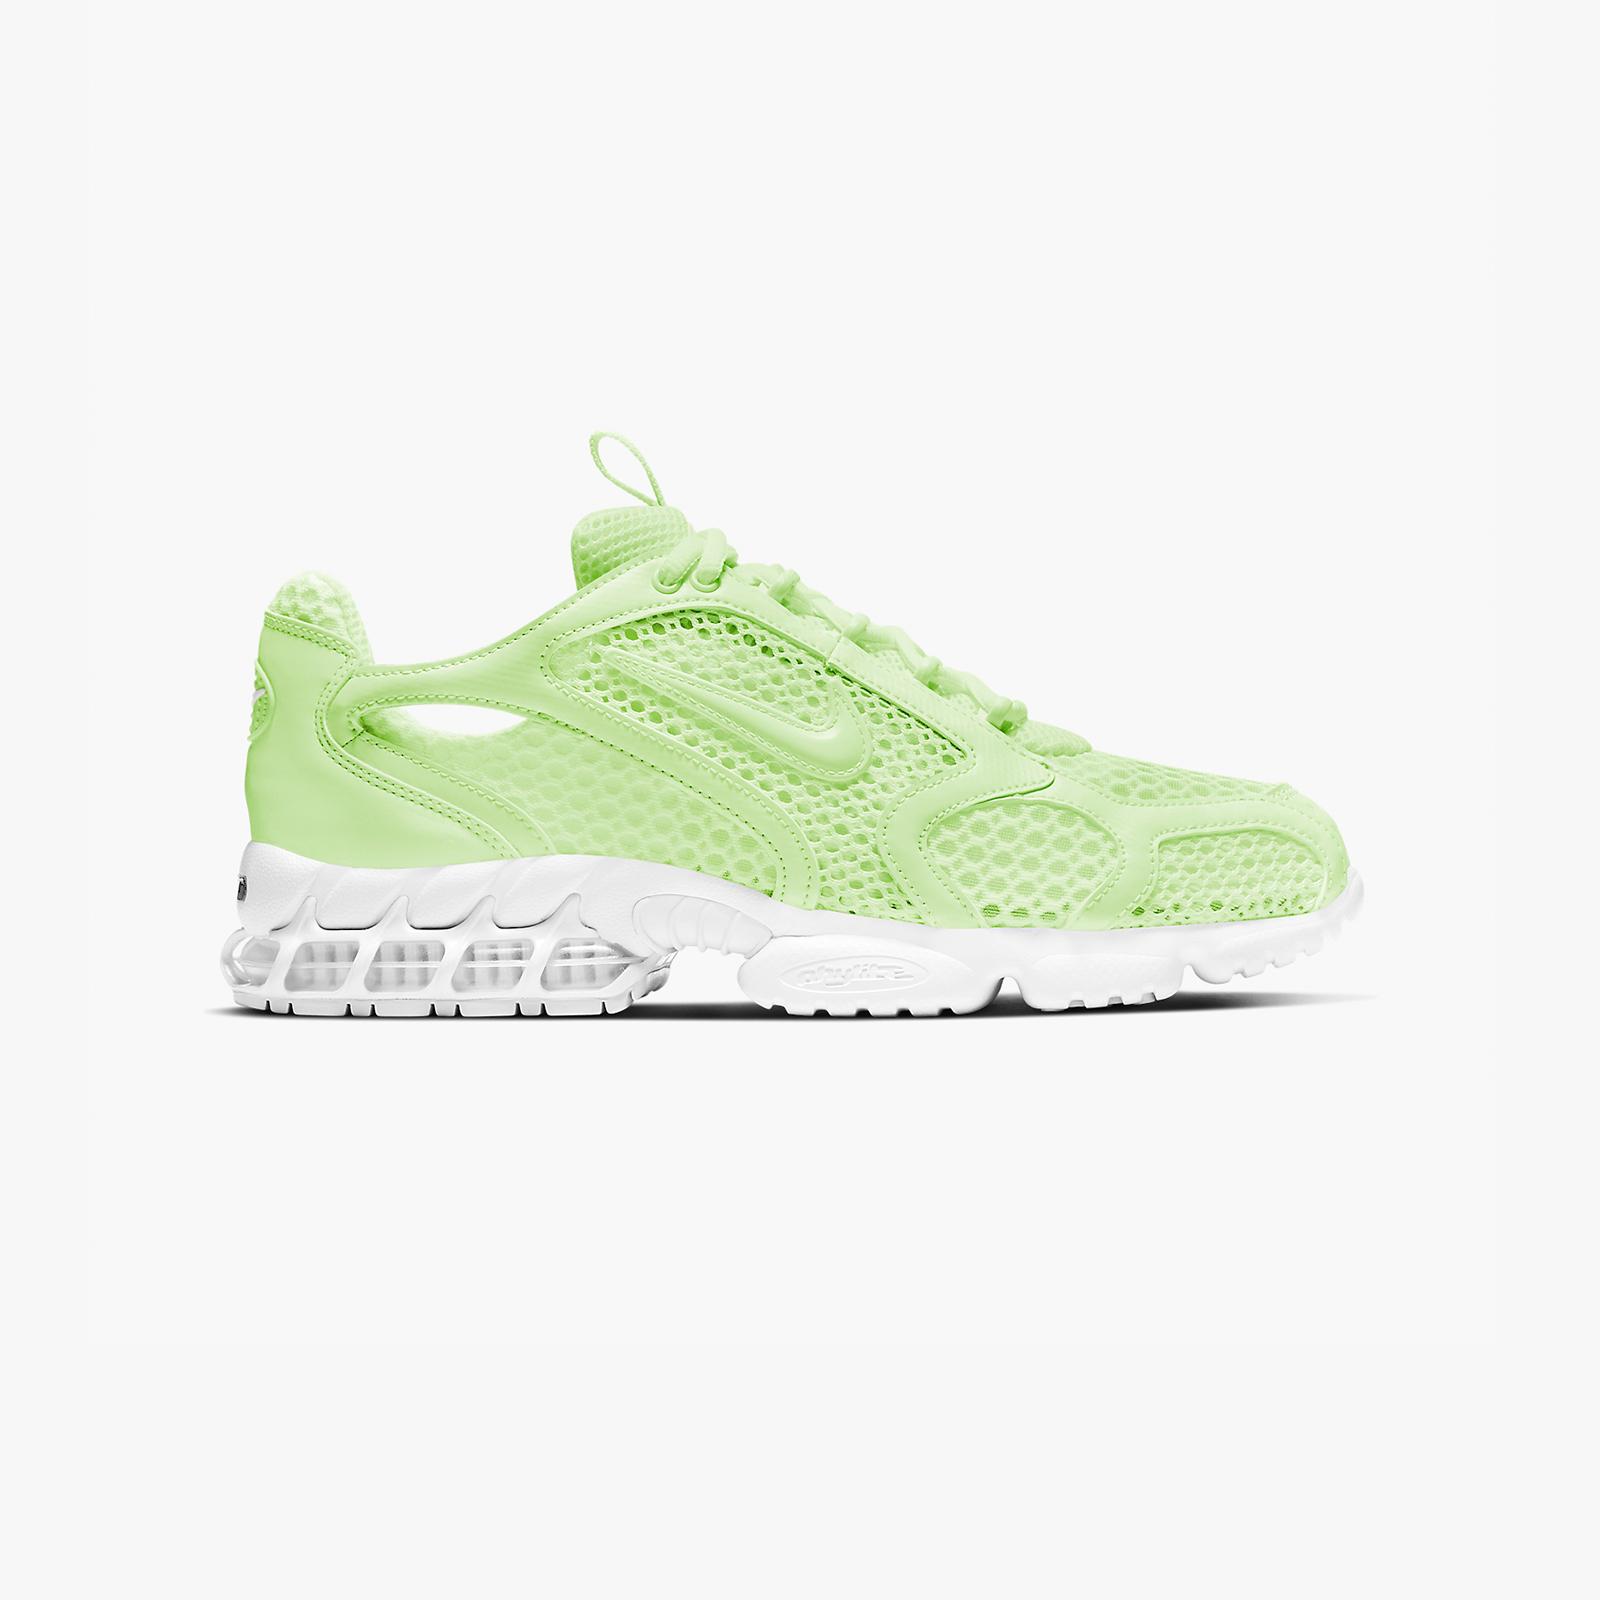 Nike Air Zoom Spiridon Cage 2 - Cj1288-700 - SNS | sneakers ...